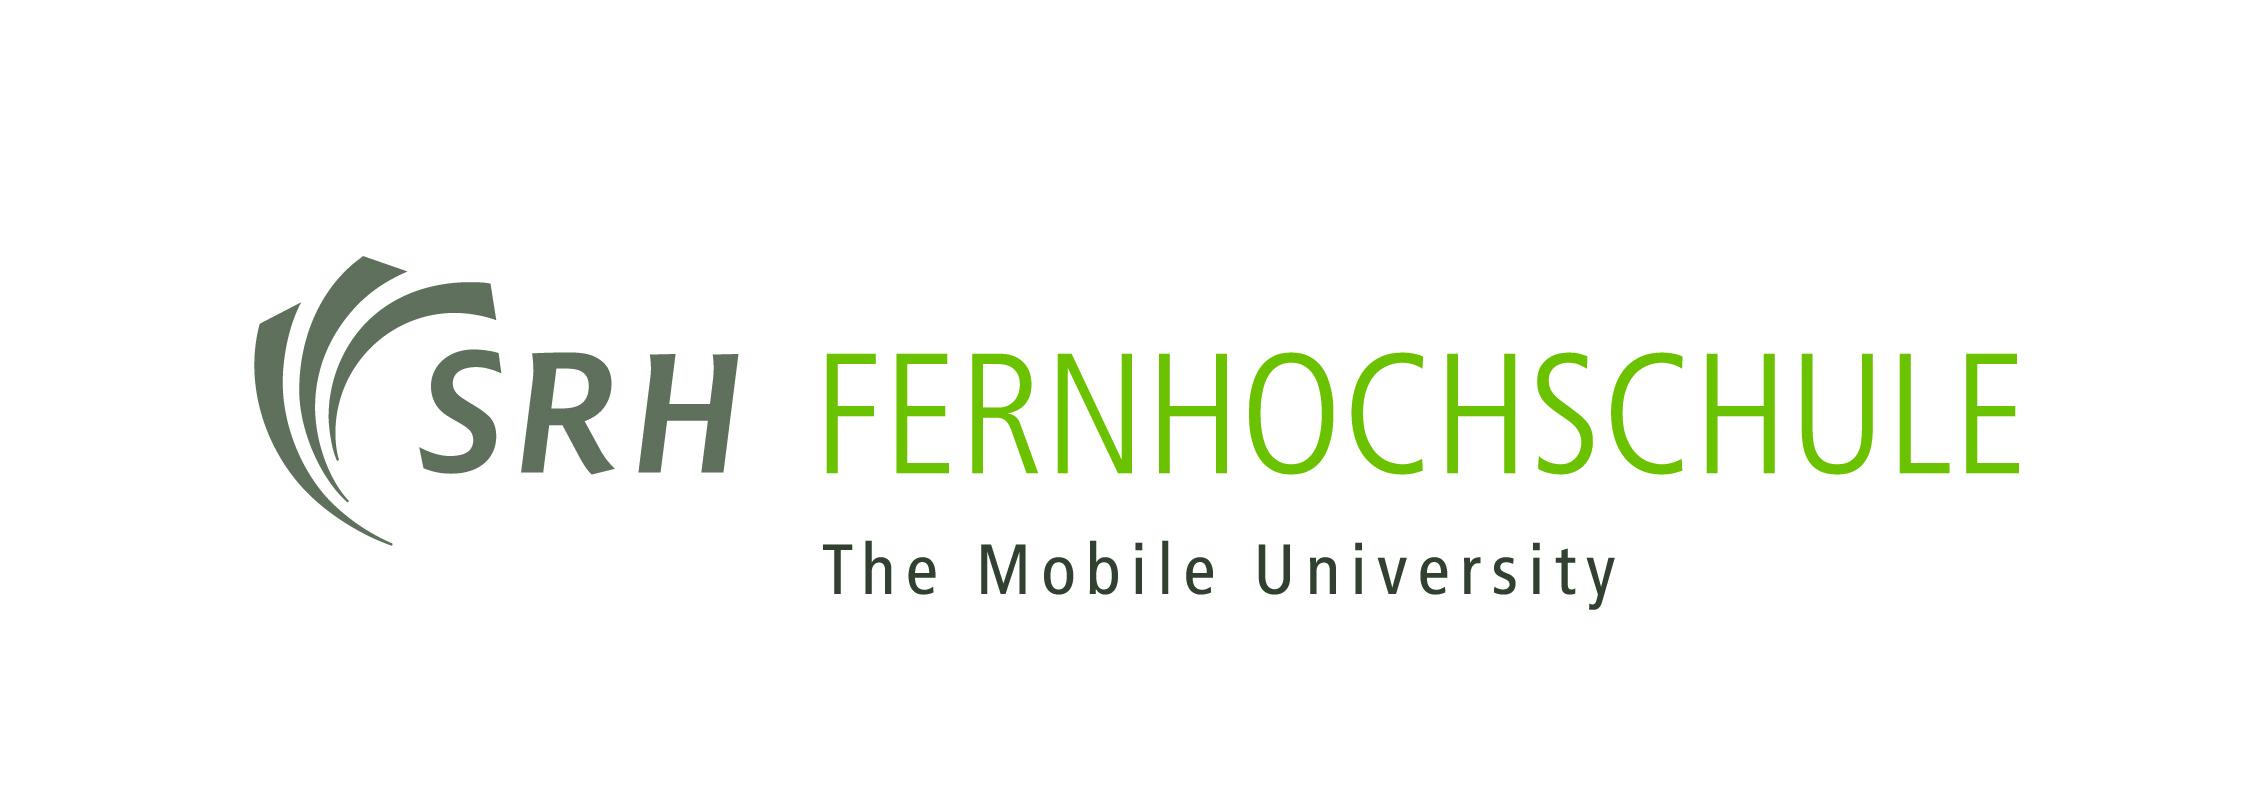 SRH FH MobileUniversity 4C 300dpi